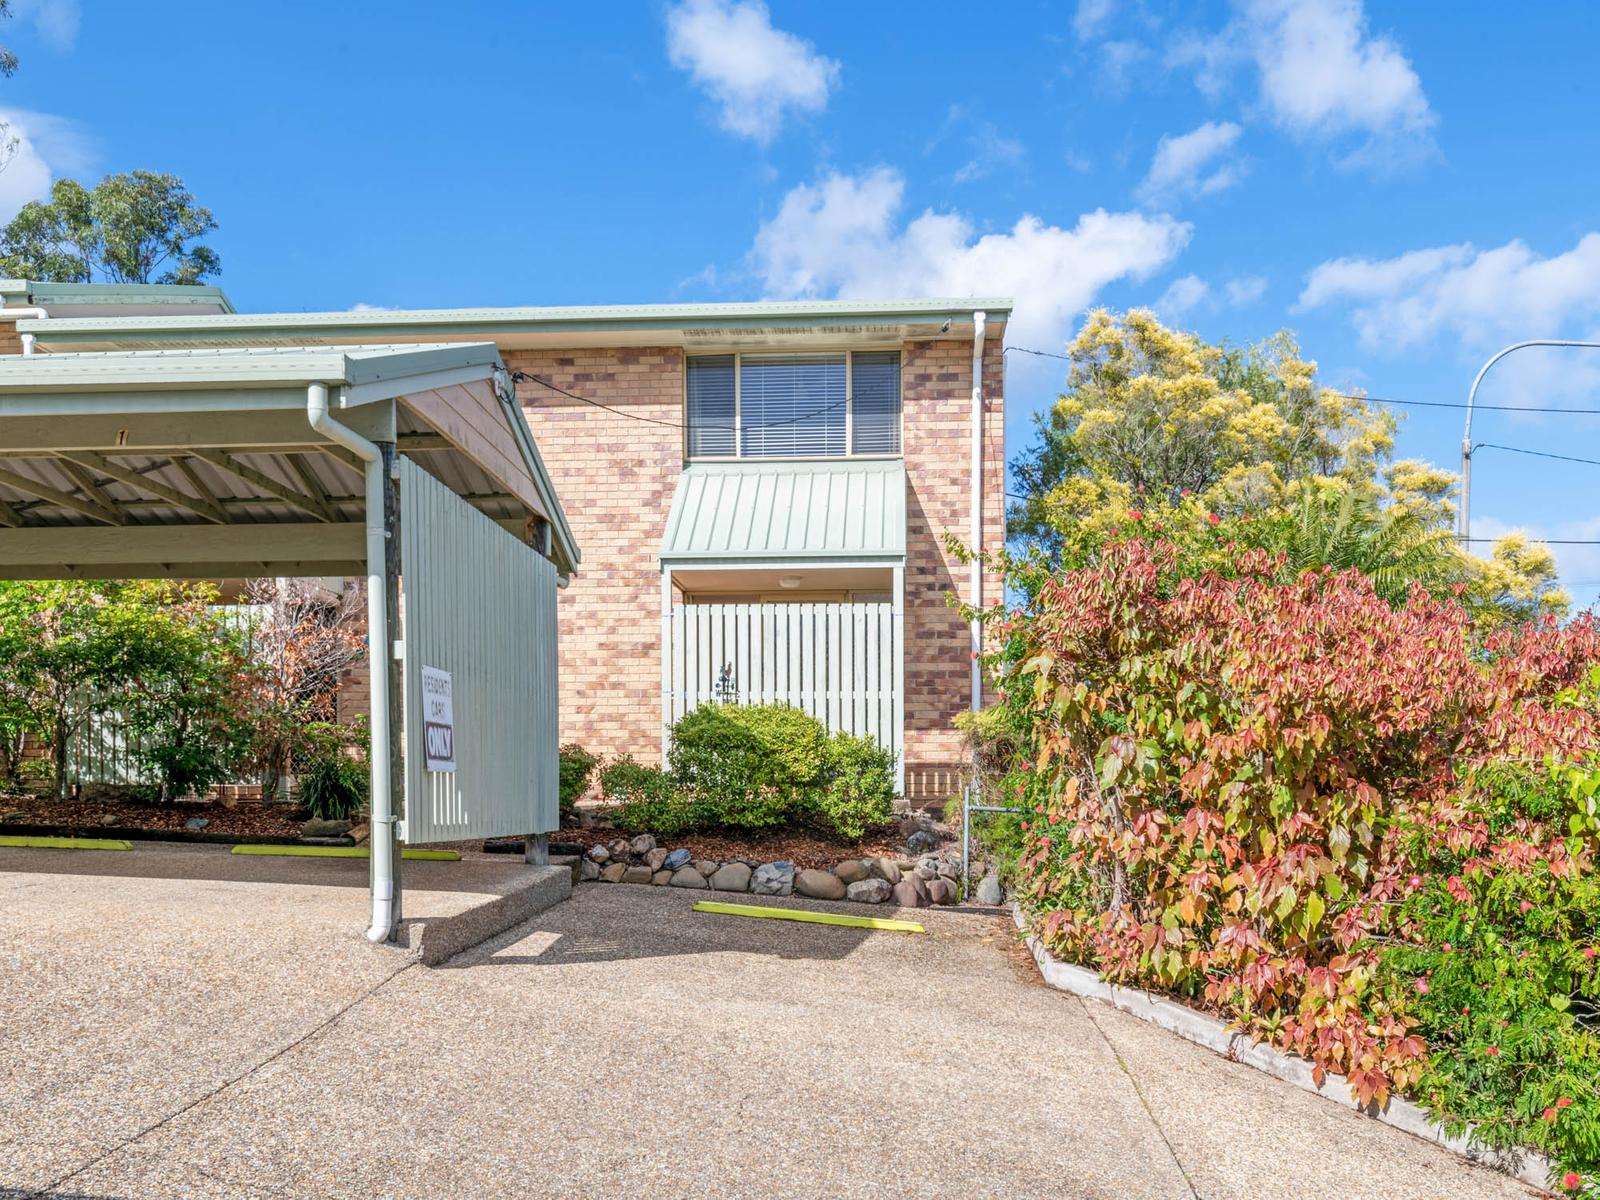 1/422 Chatswood Road, Shailer Park QLD 4128